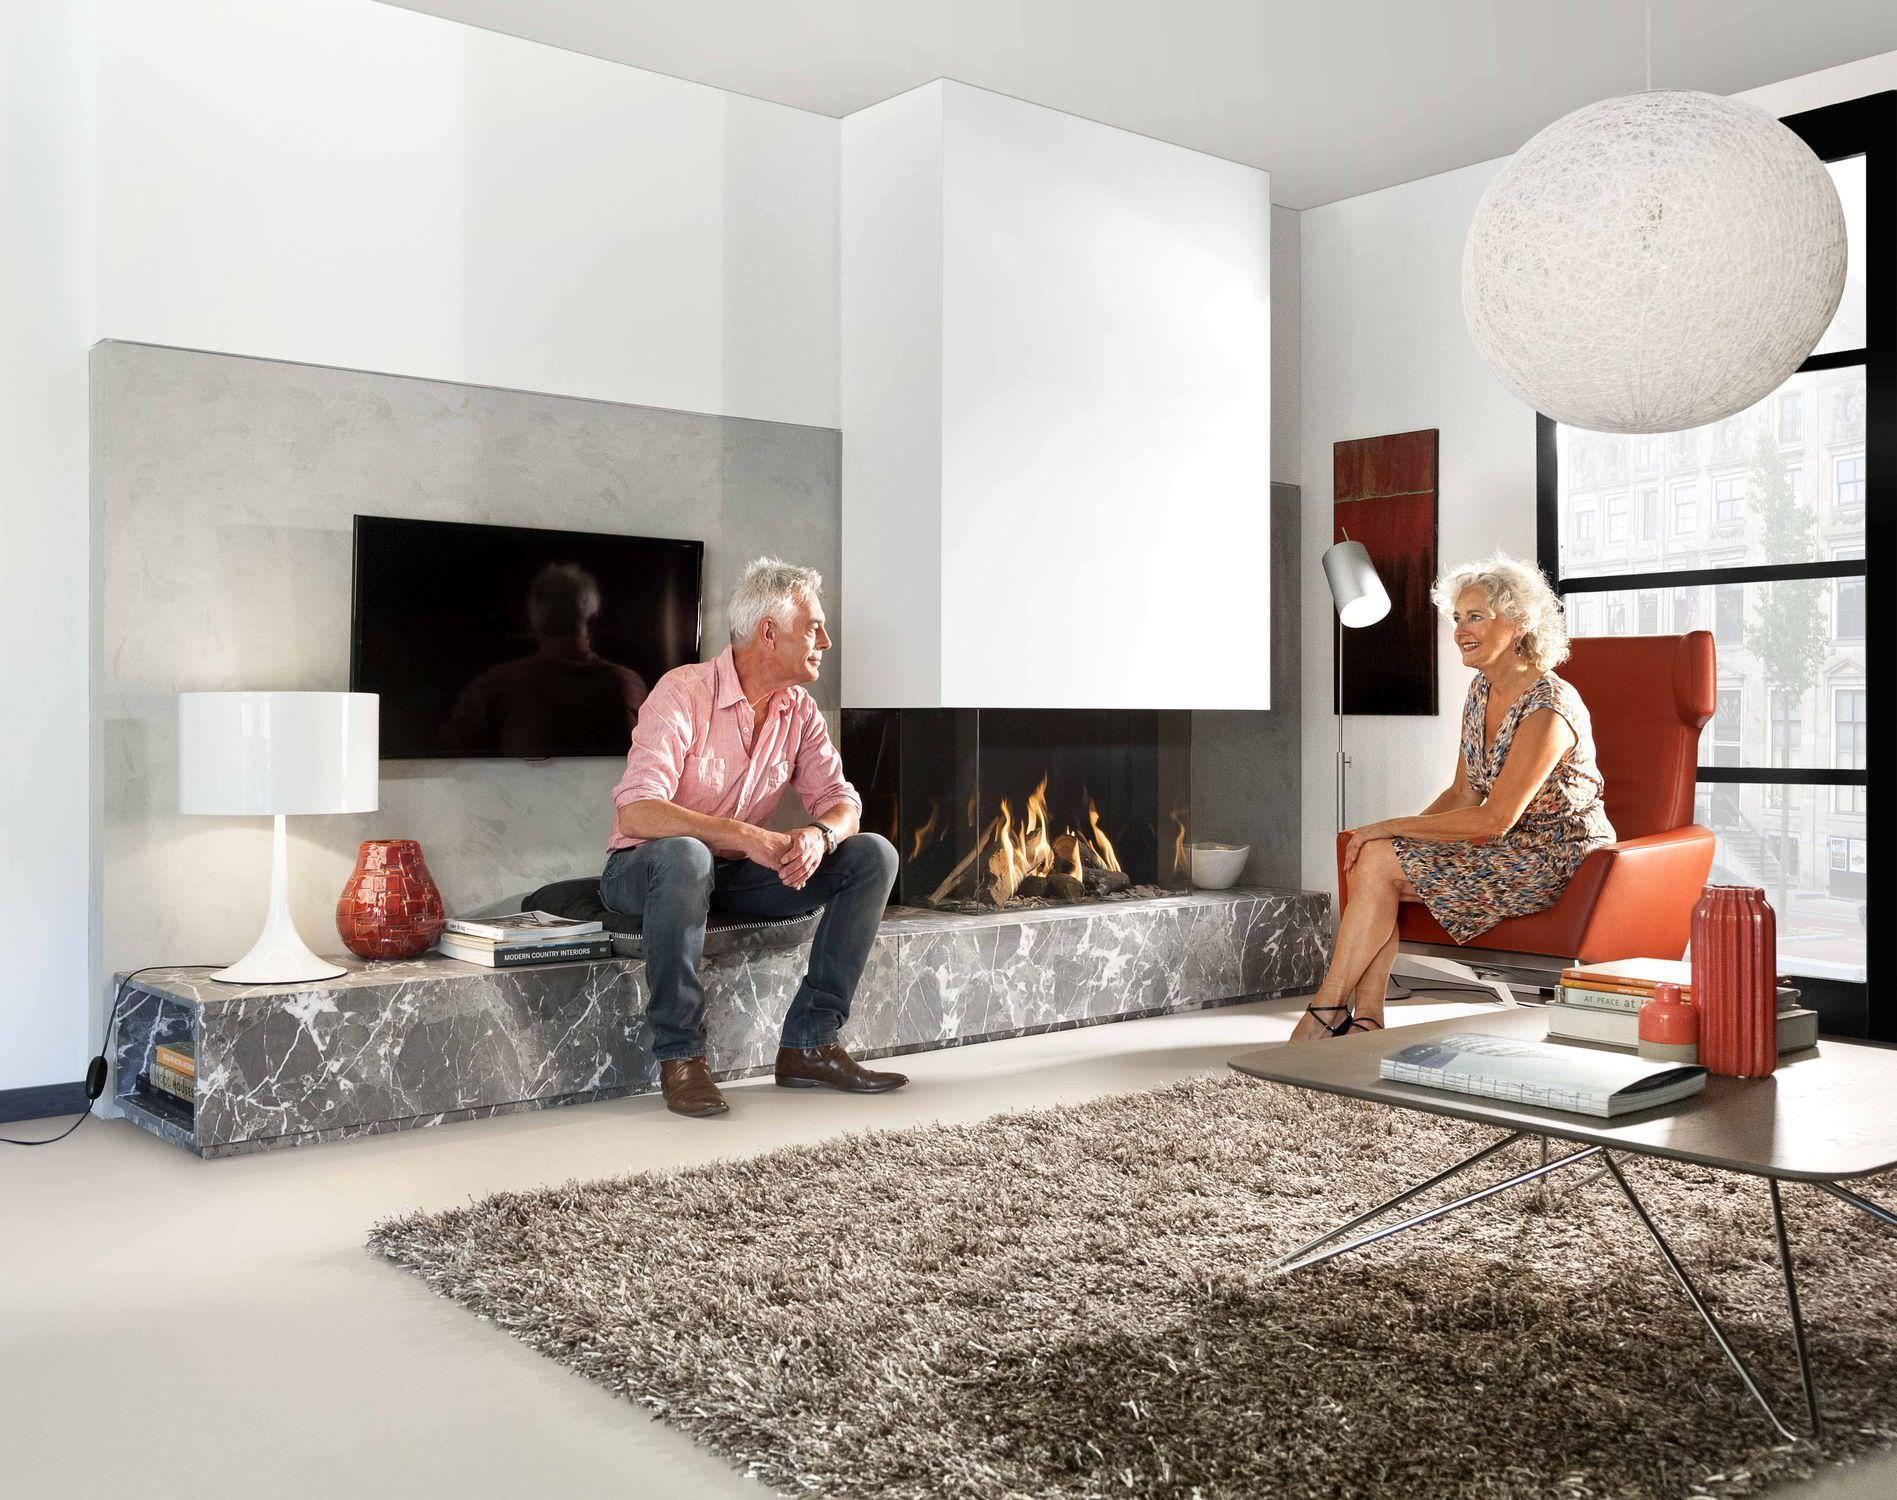 gas fireplace 3 sided closed hearth contemporary fairo eco